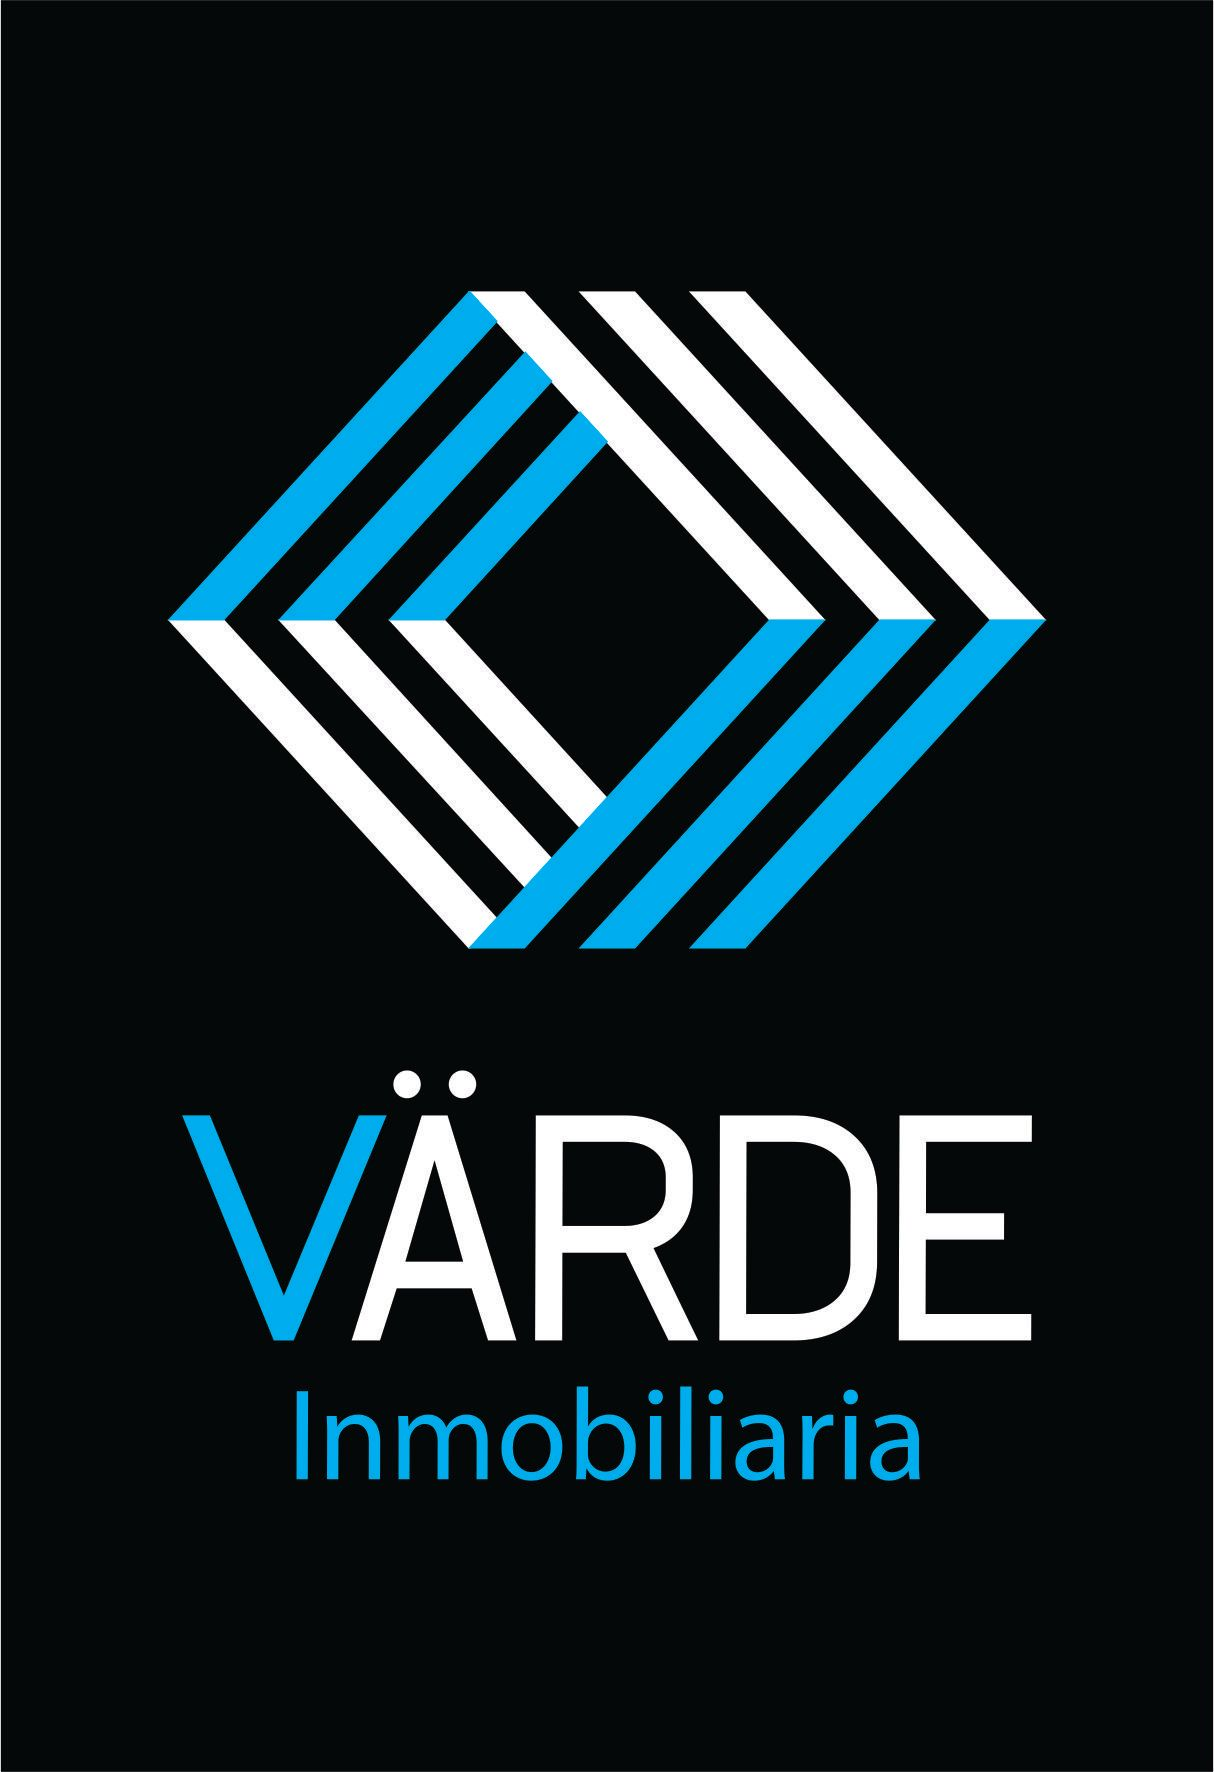 Logo de  Vardeinmobiliaria